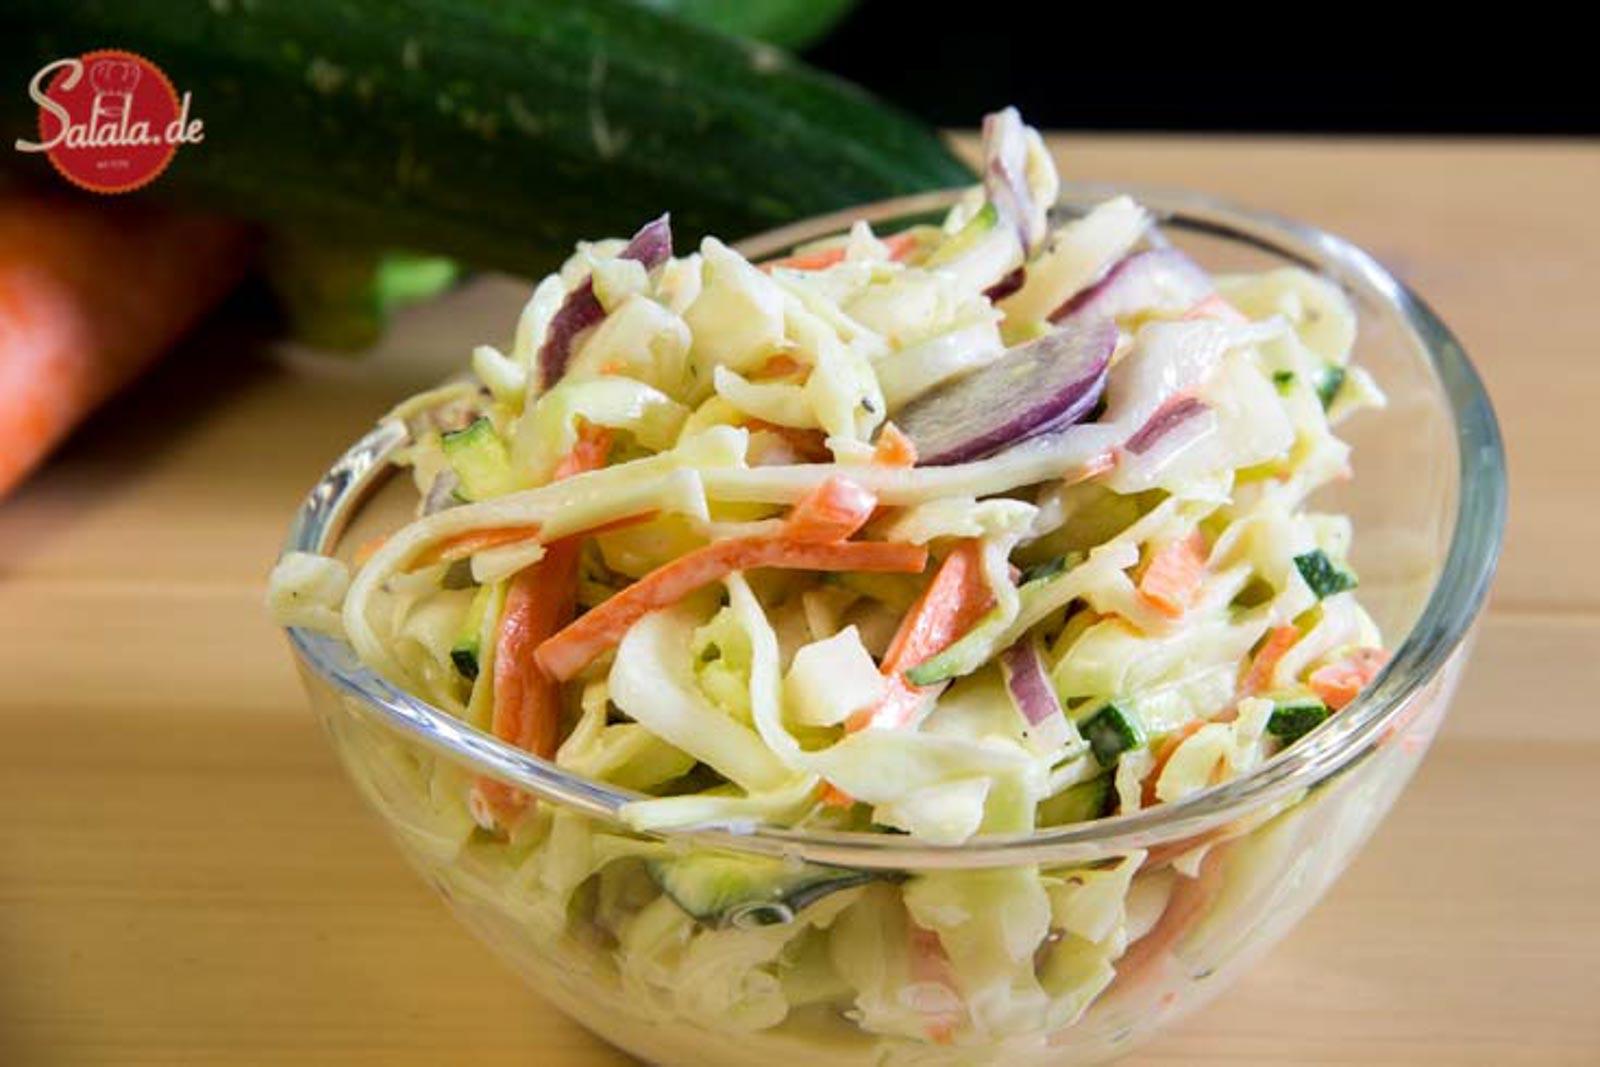 Coleslaw – Amerikanischer Krautsalat – low carb – glutenfrei – vegetarisch